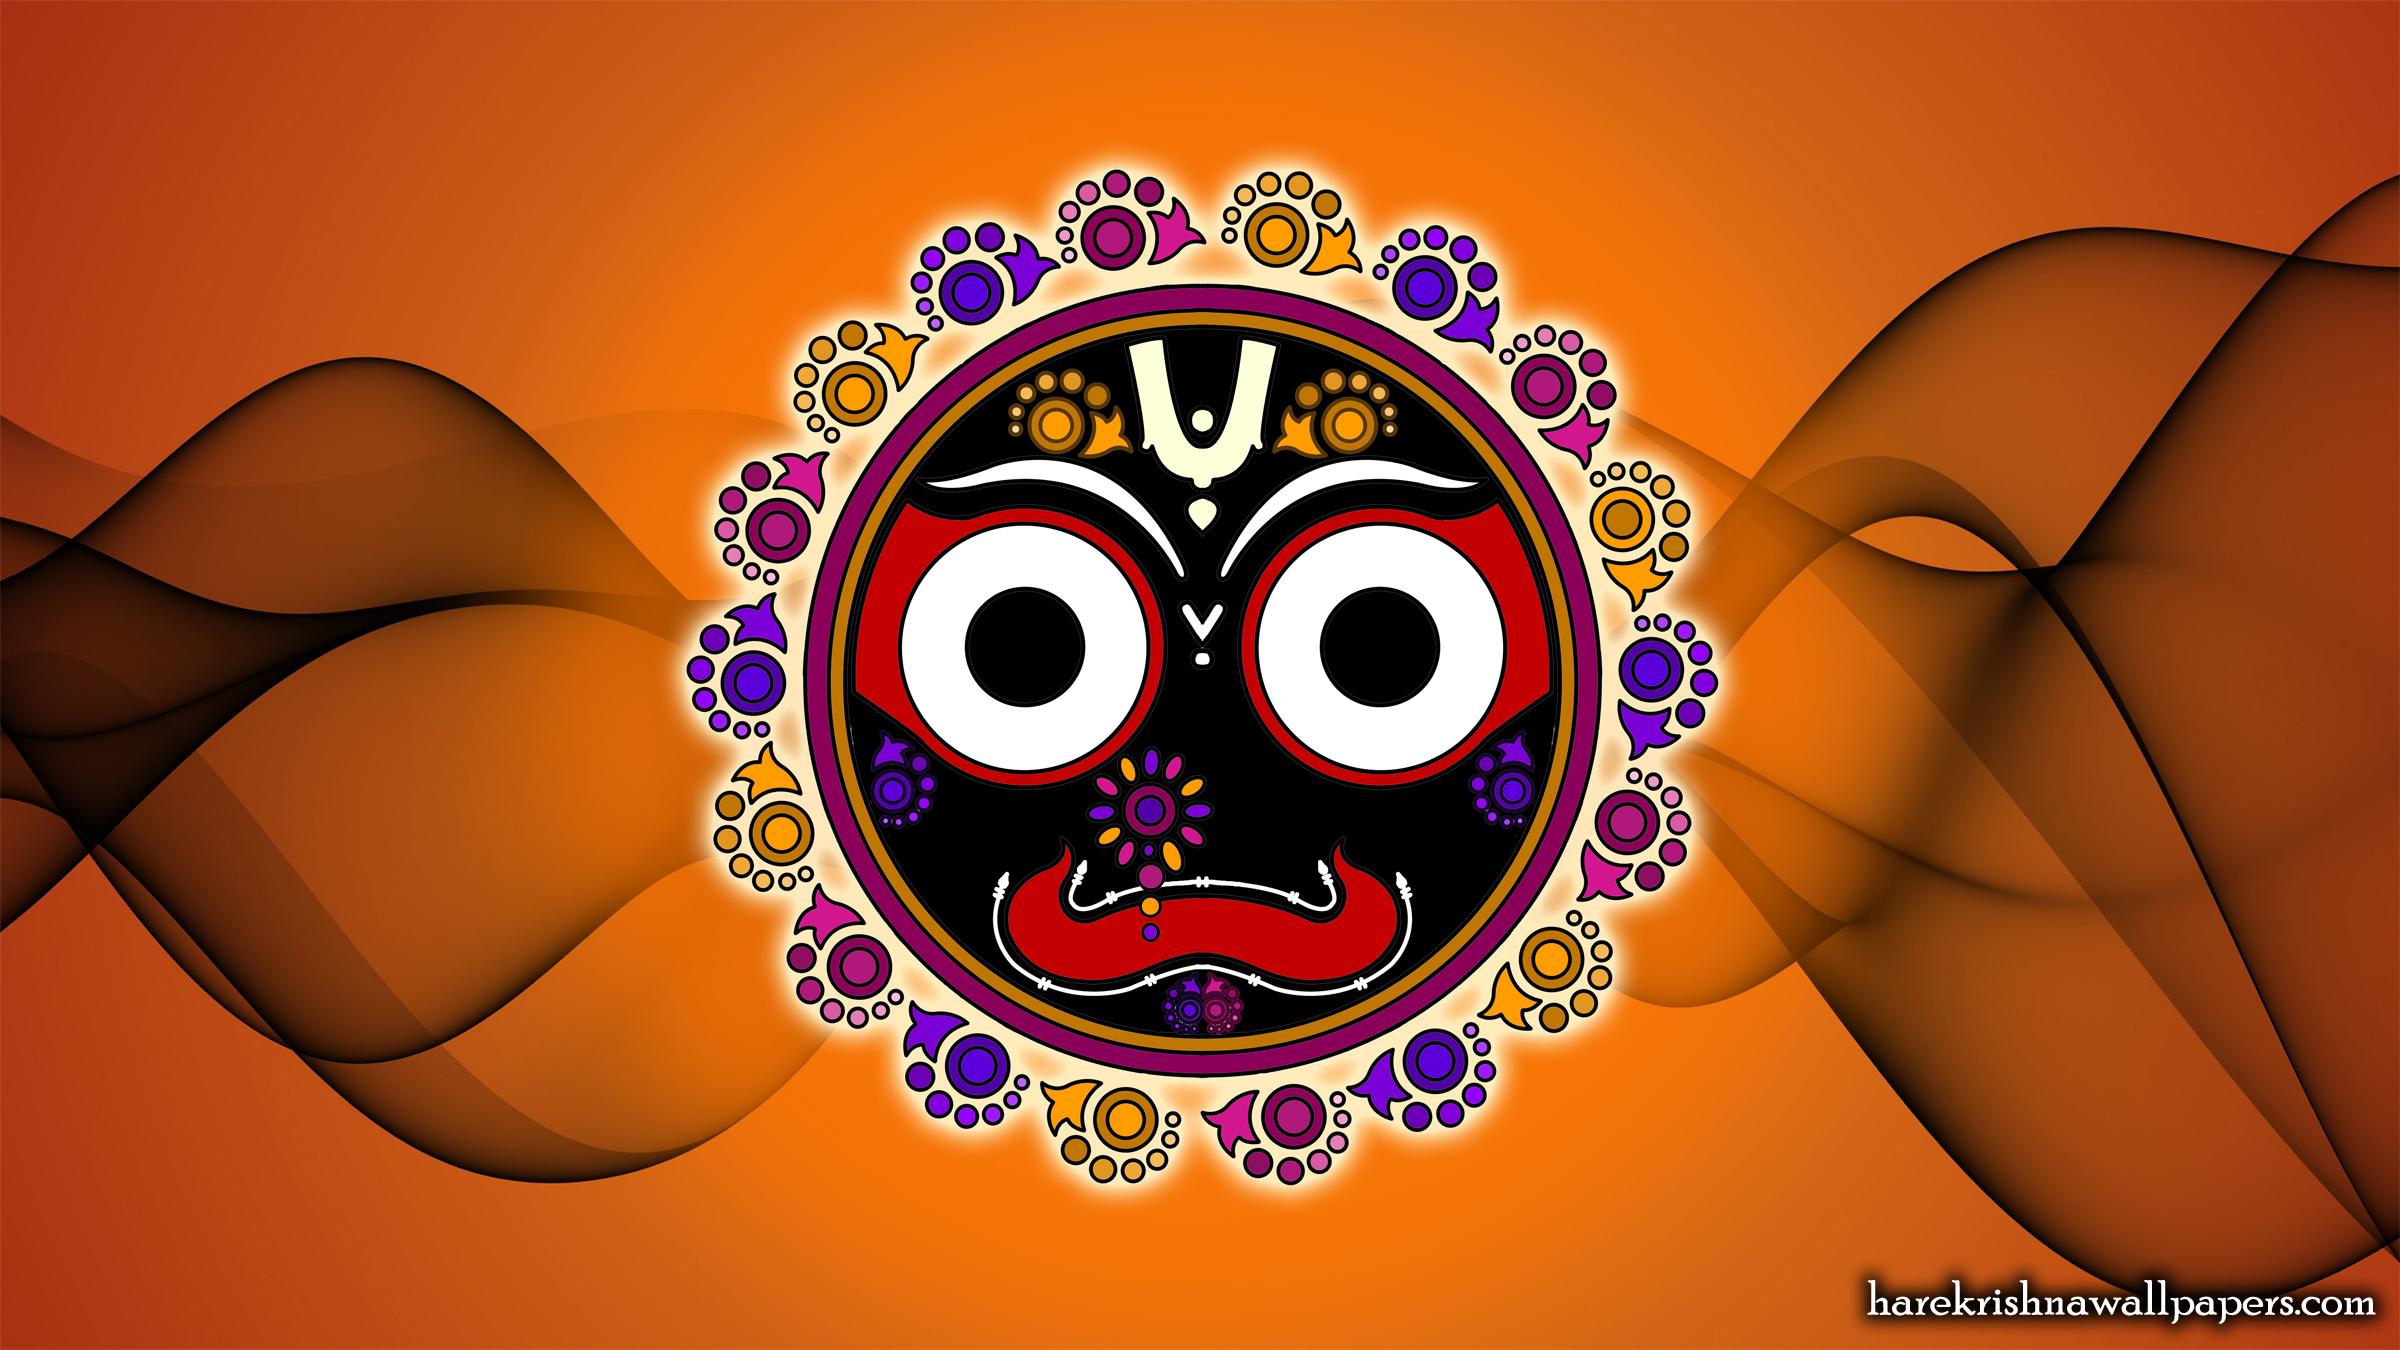 Jai Jagannath Wallpaper (043) Size 2400x1350 Download